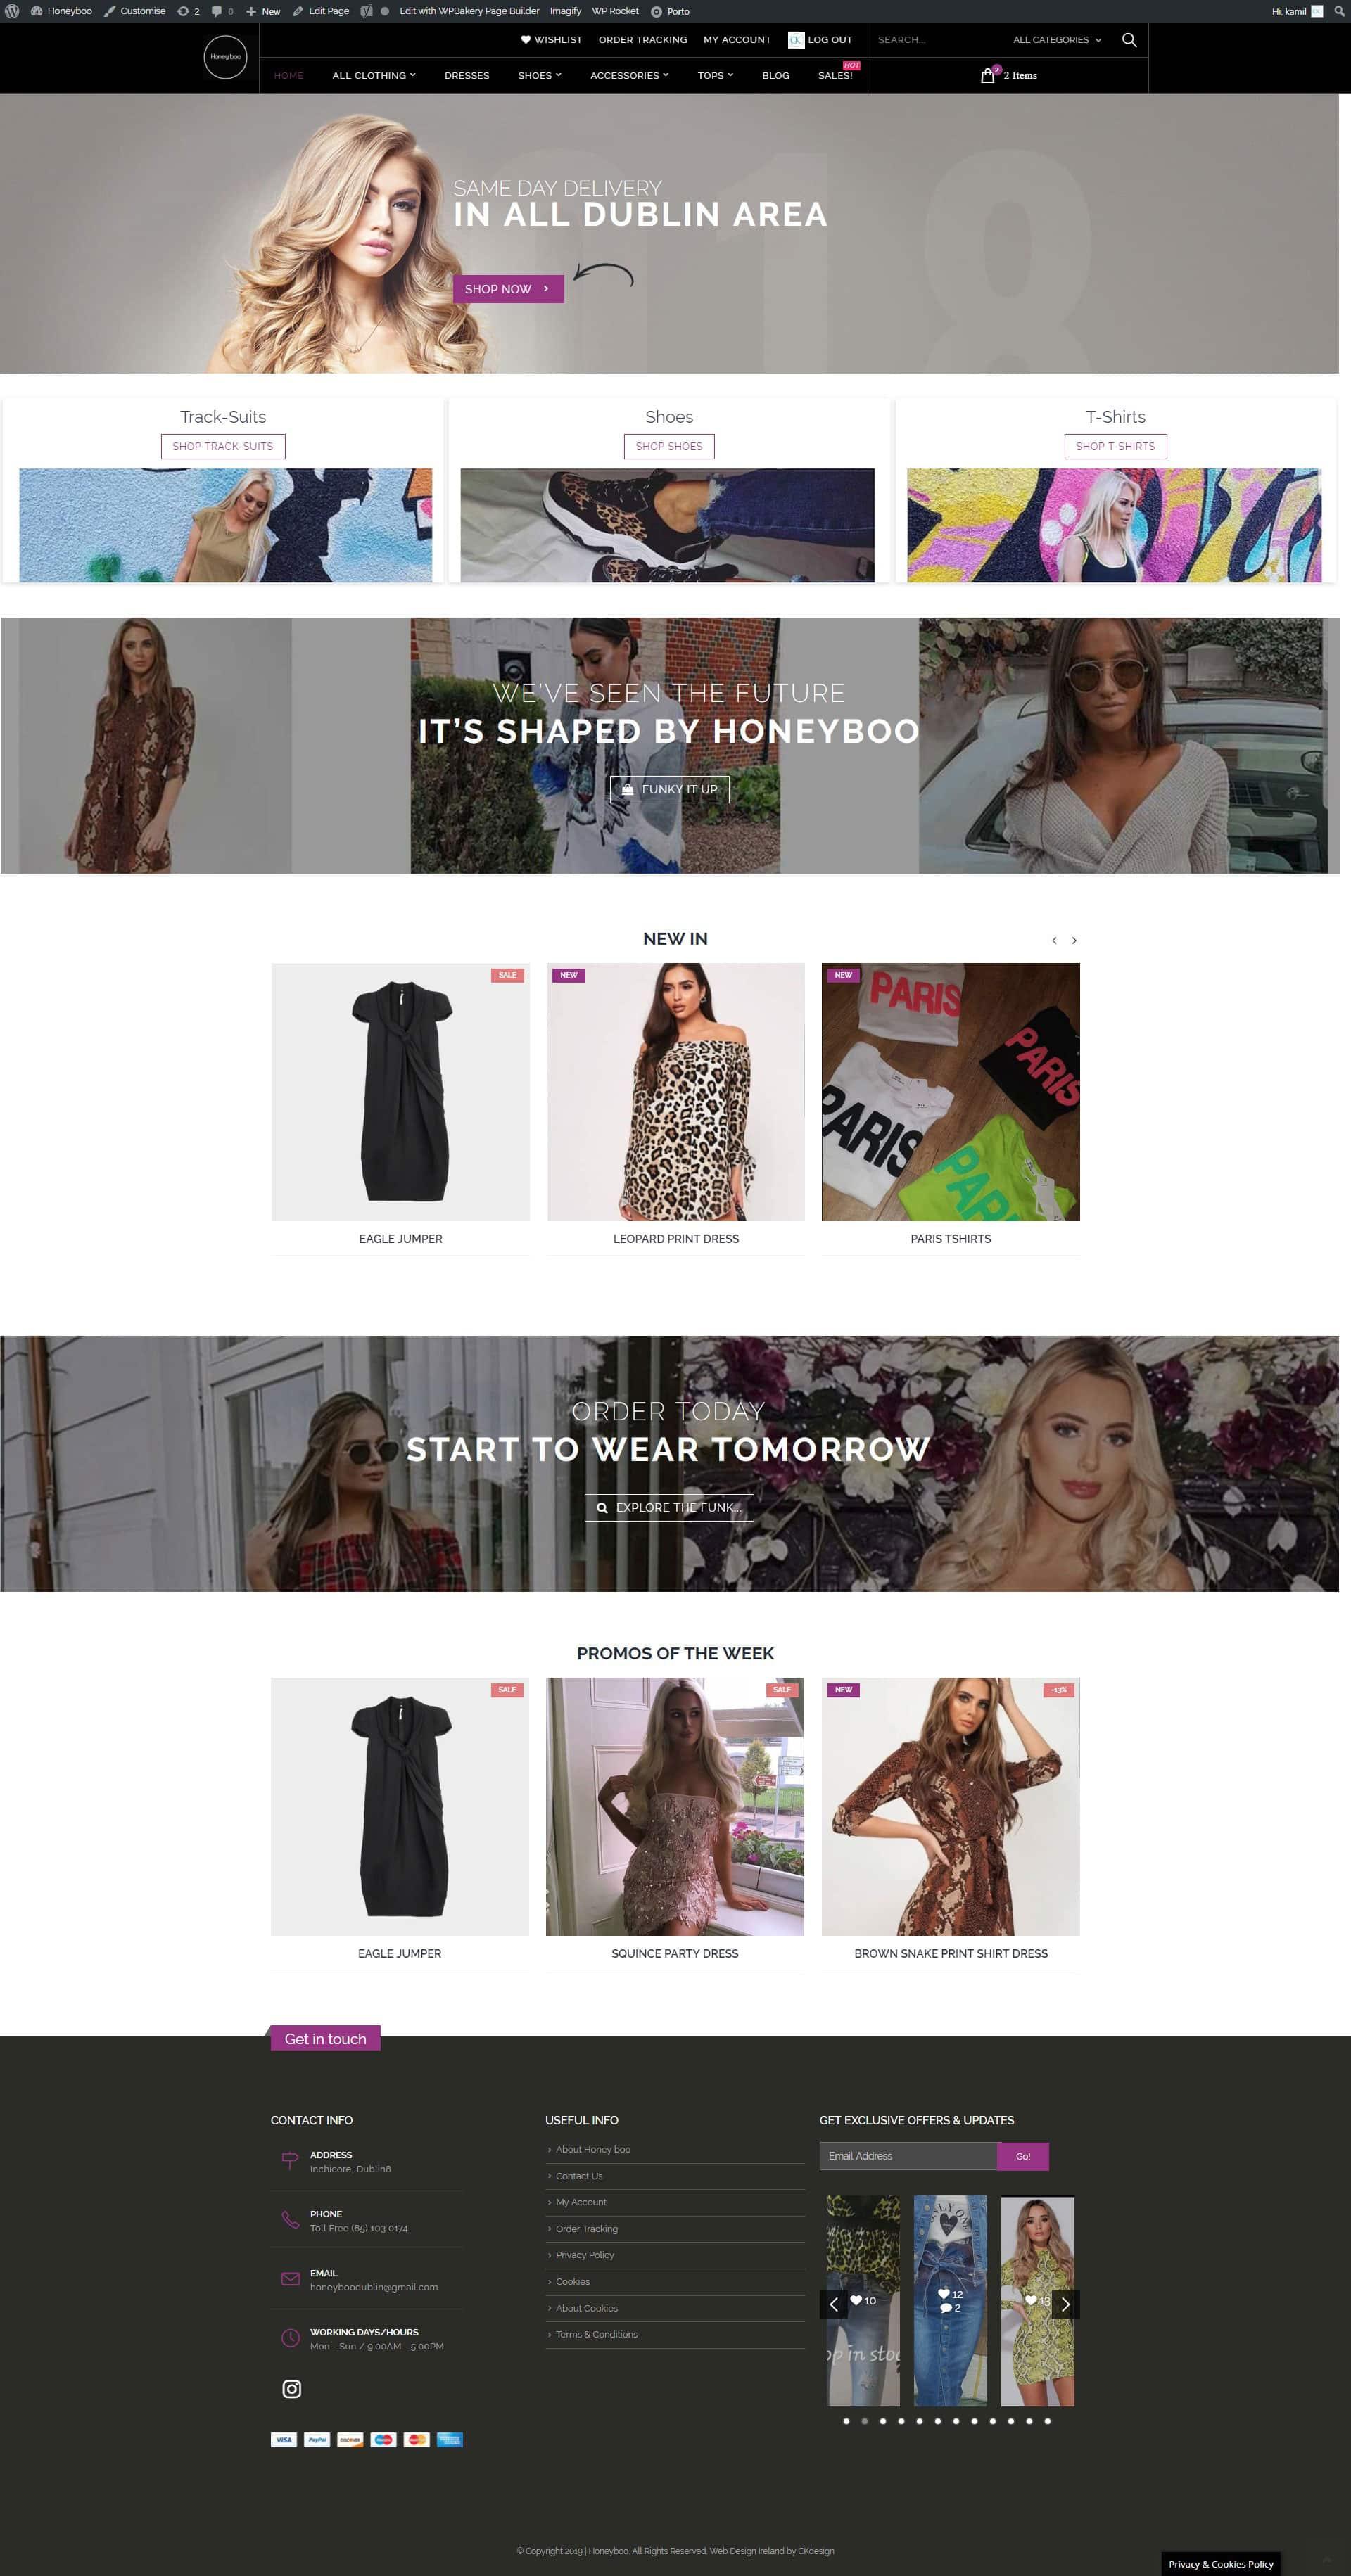 website design Dublin website design of honeyboo by ckwebsitedesign